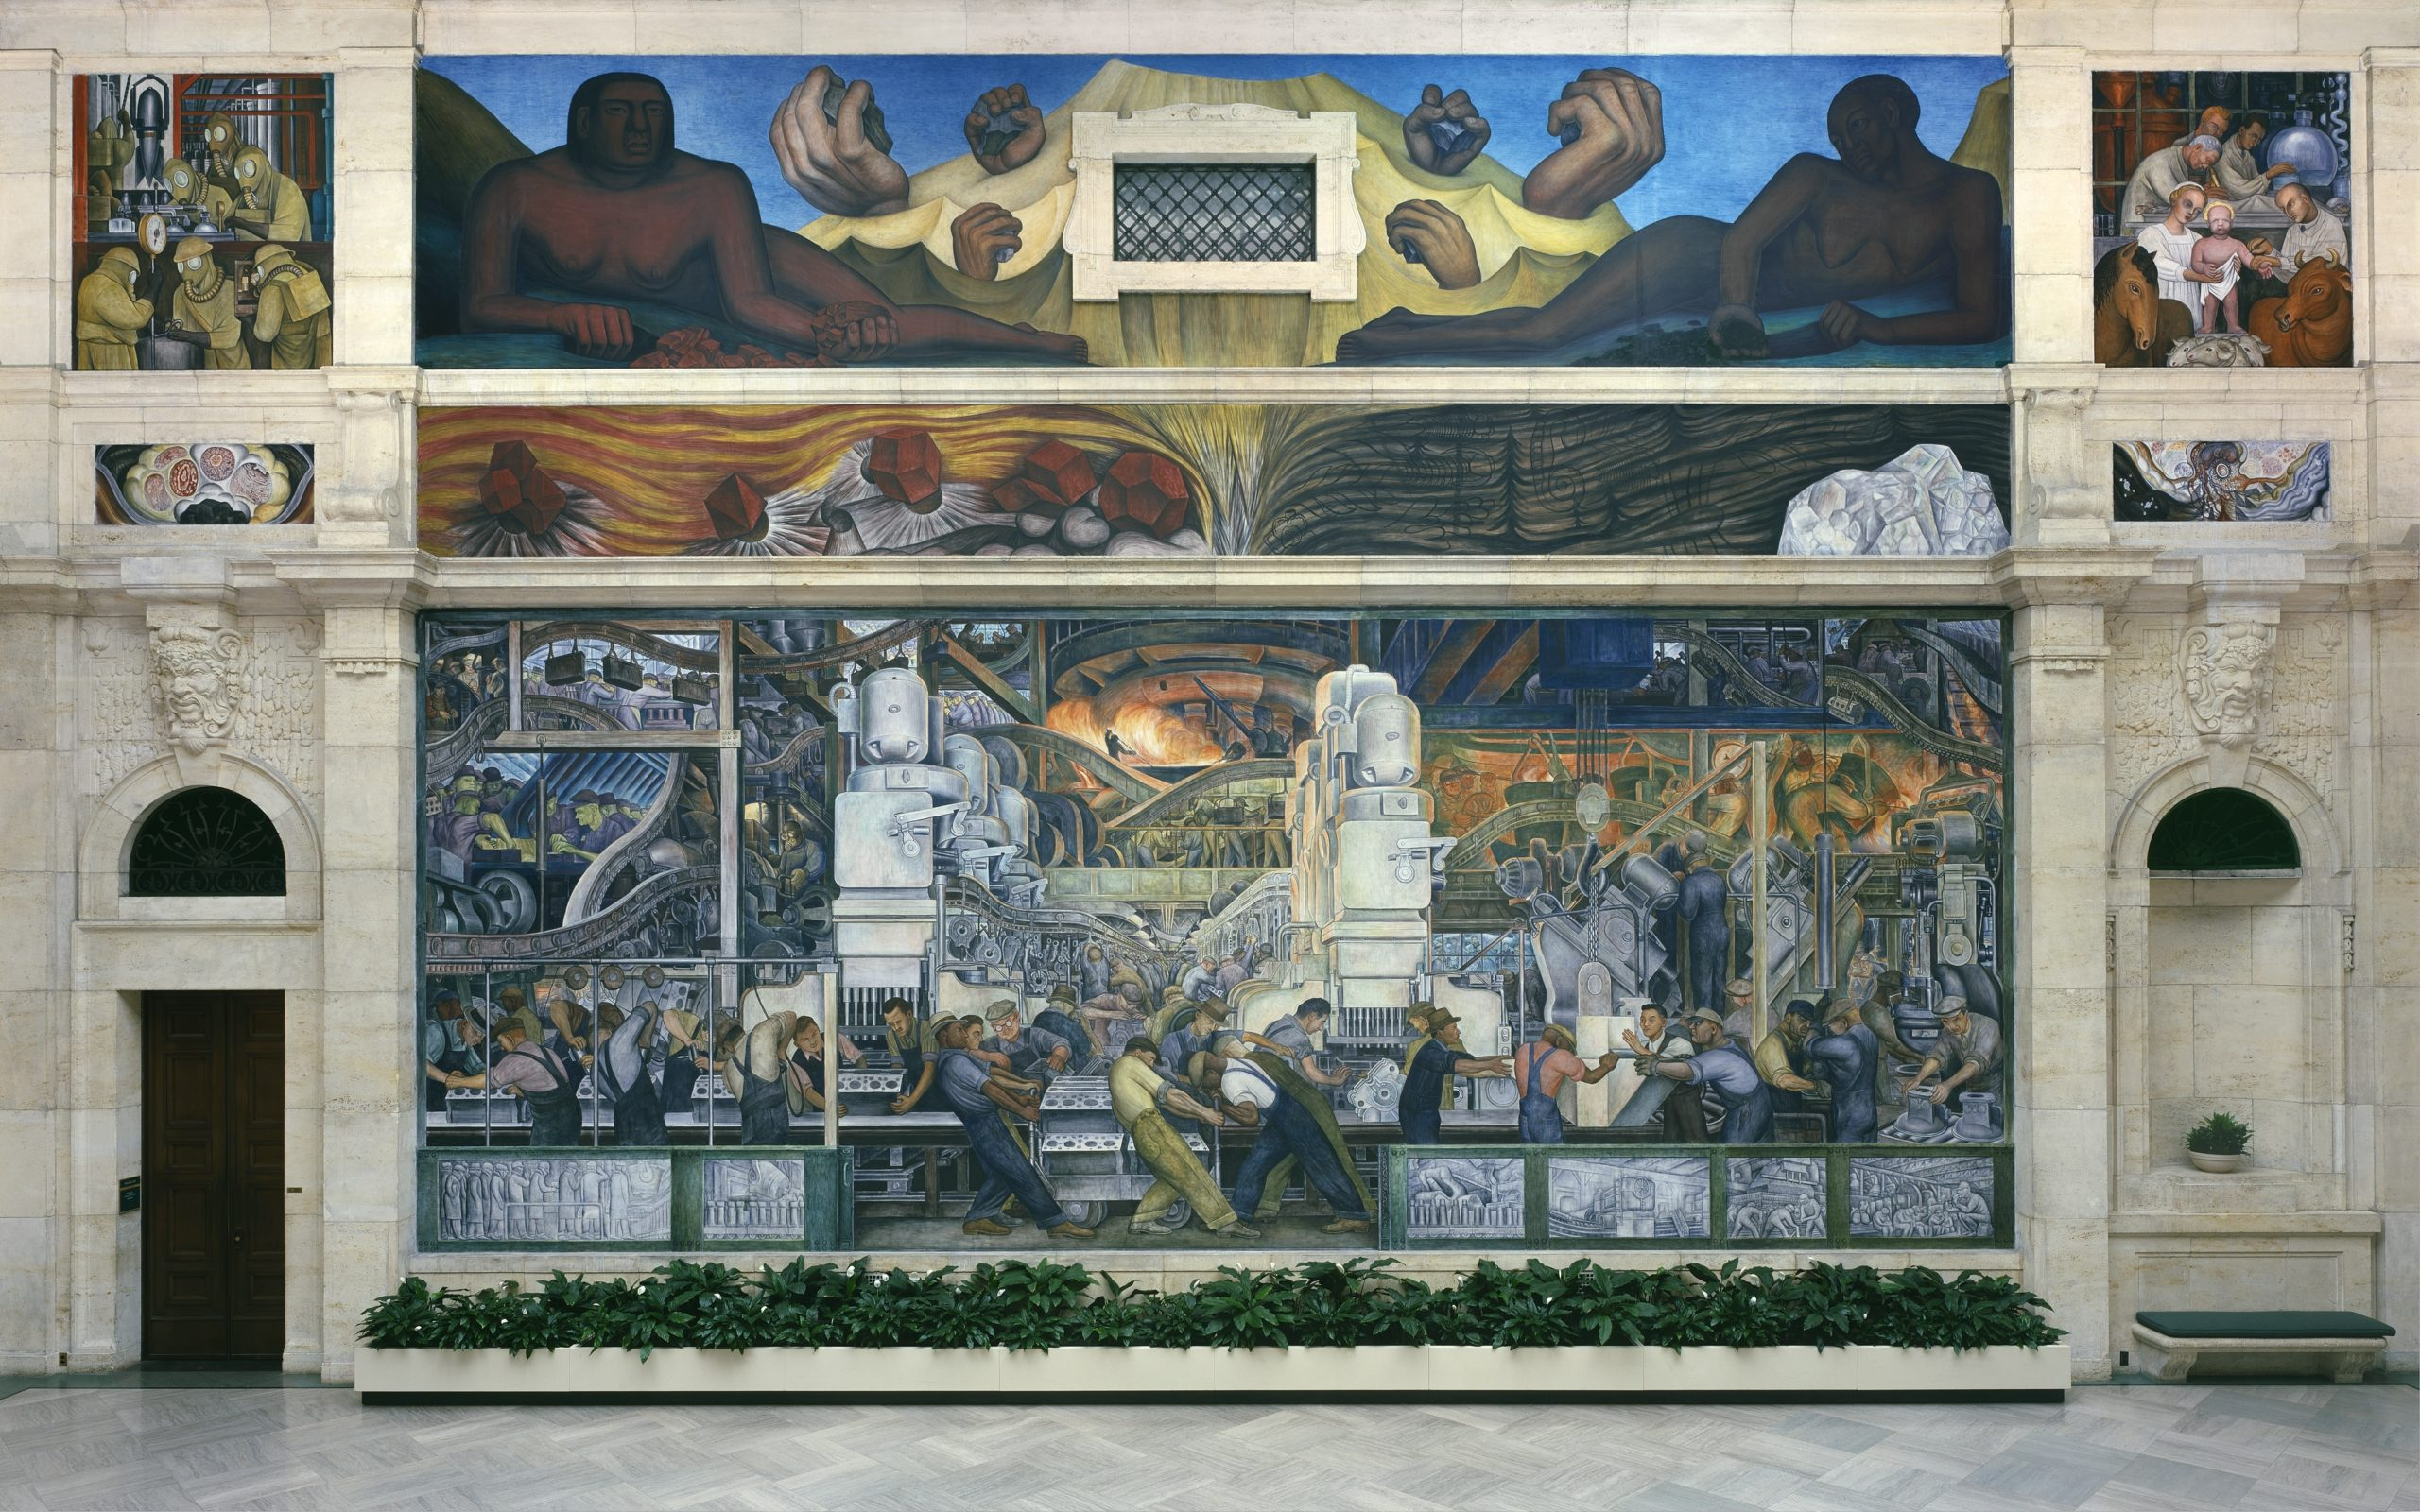 DIA Diego Rivera mural